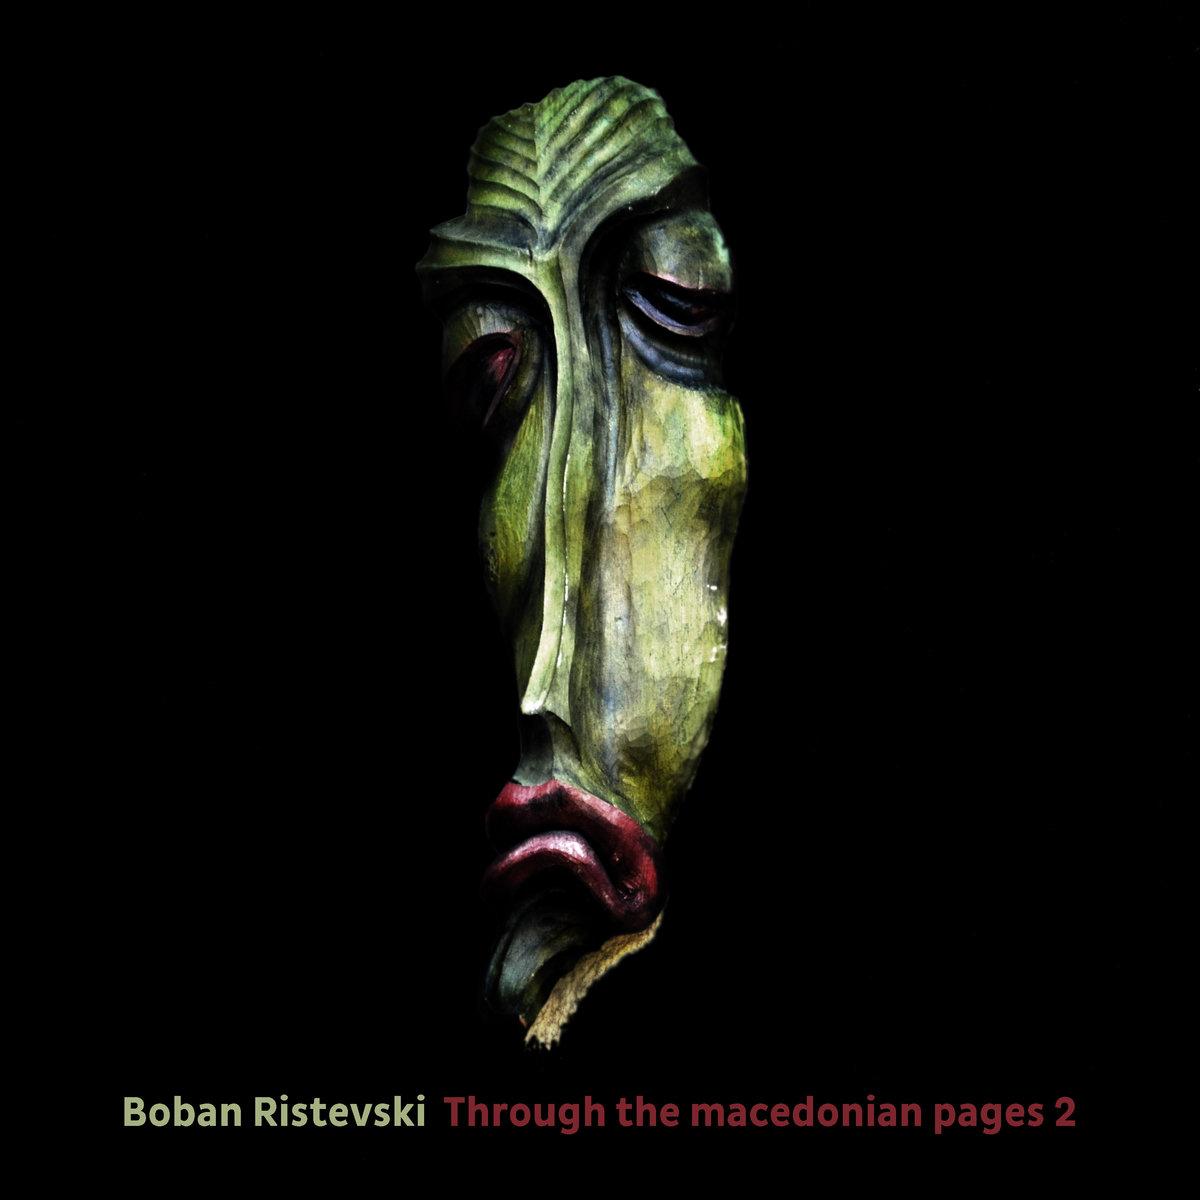 Boban Ristevski – Through the macedonian pages 2